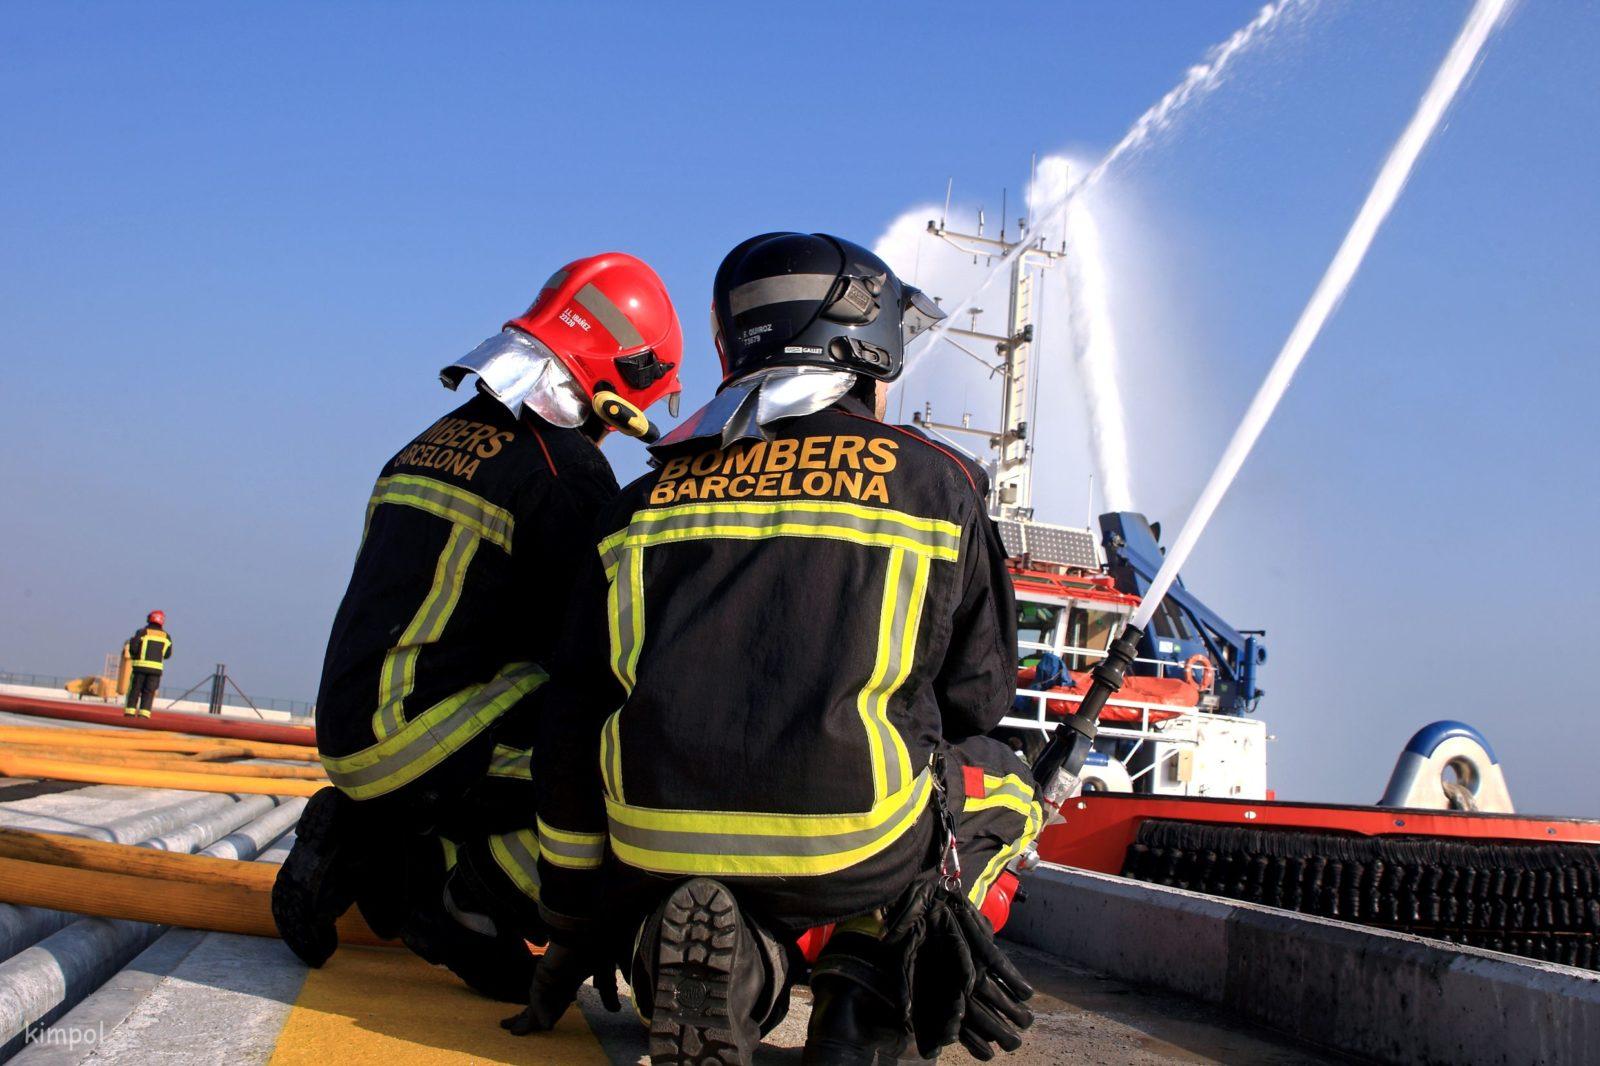 bomberos barcelona 2019